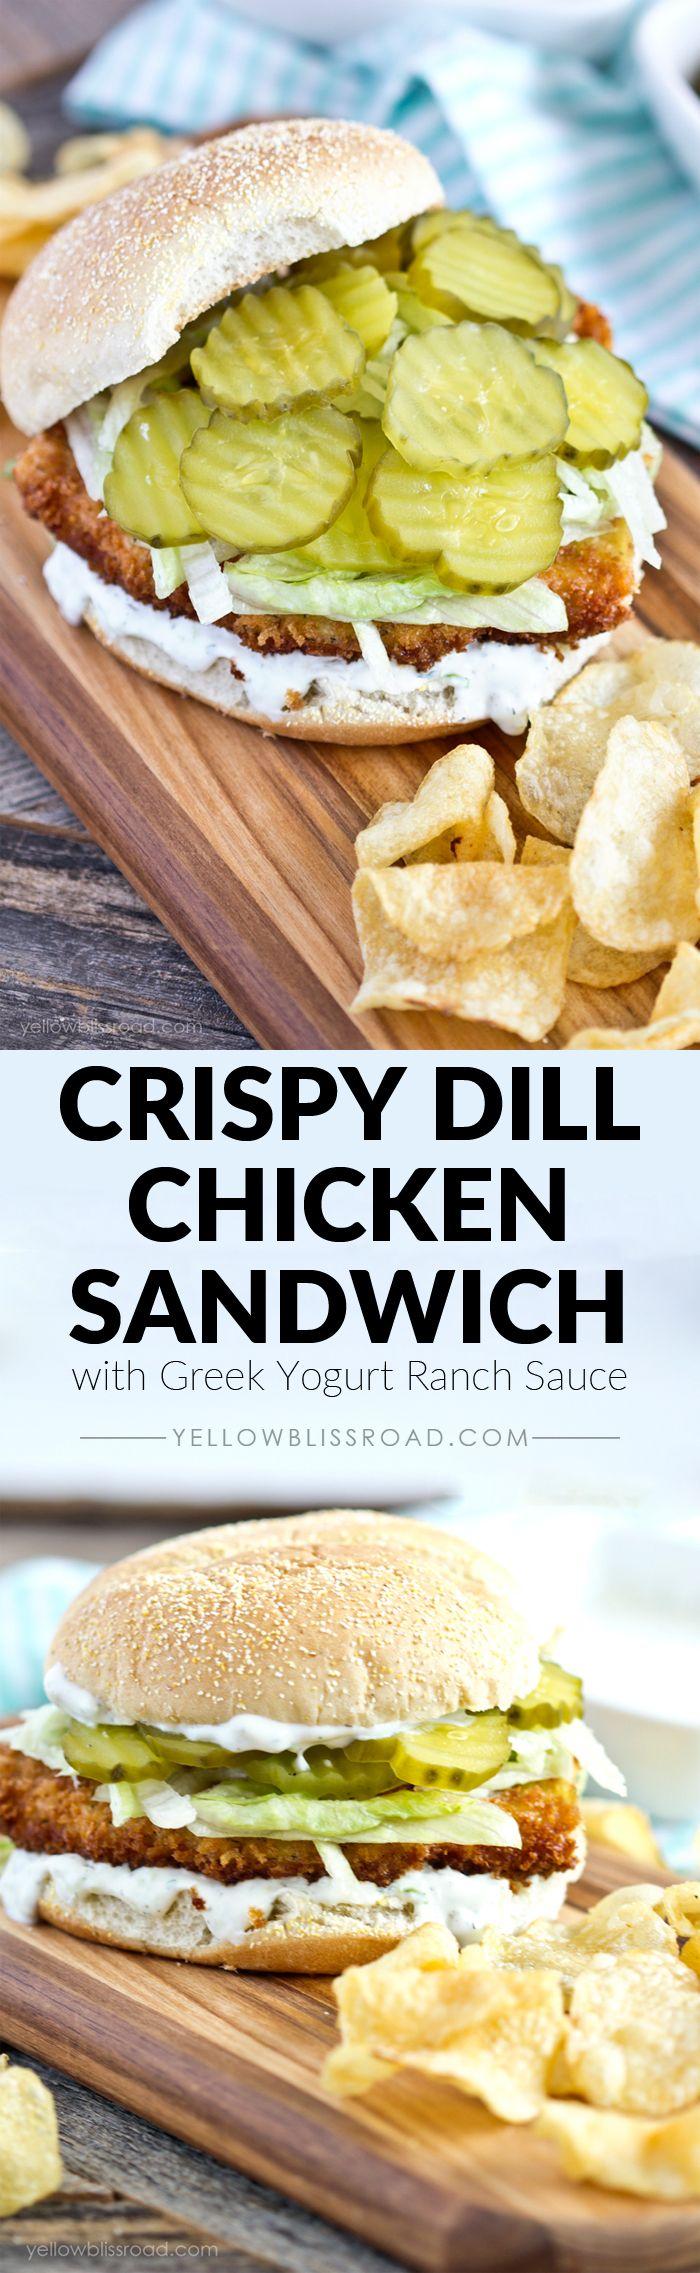 Crispy Dill Chicken Sandwich with Greek Yogurt Ranch Spread #ad @HVRanch